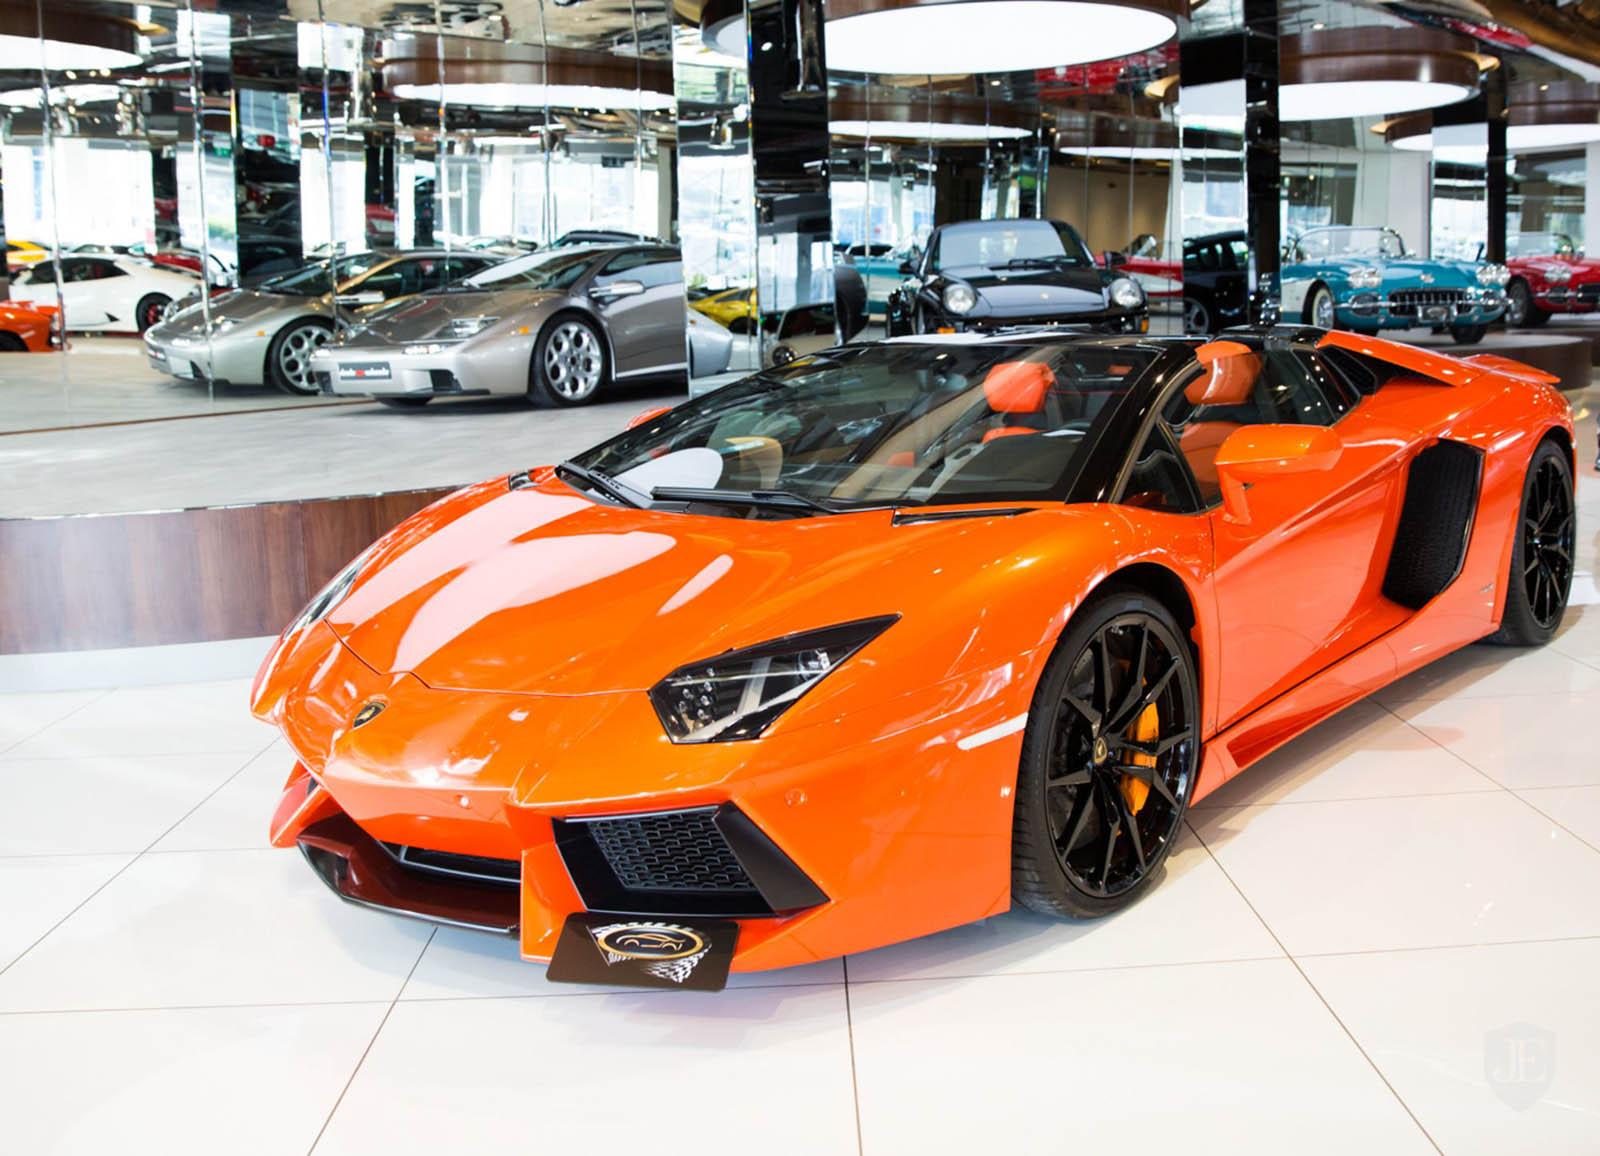 Lamborghini Aventador In Pepto Pink Over Orange Has Got To